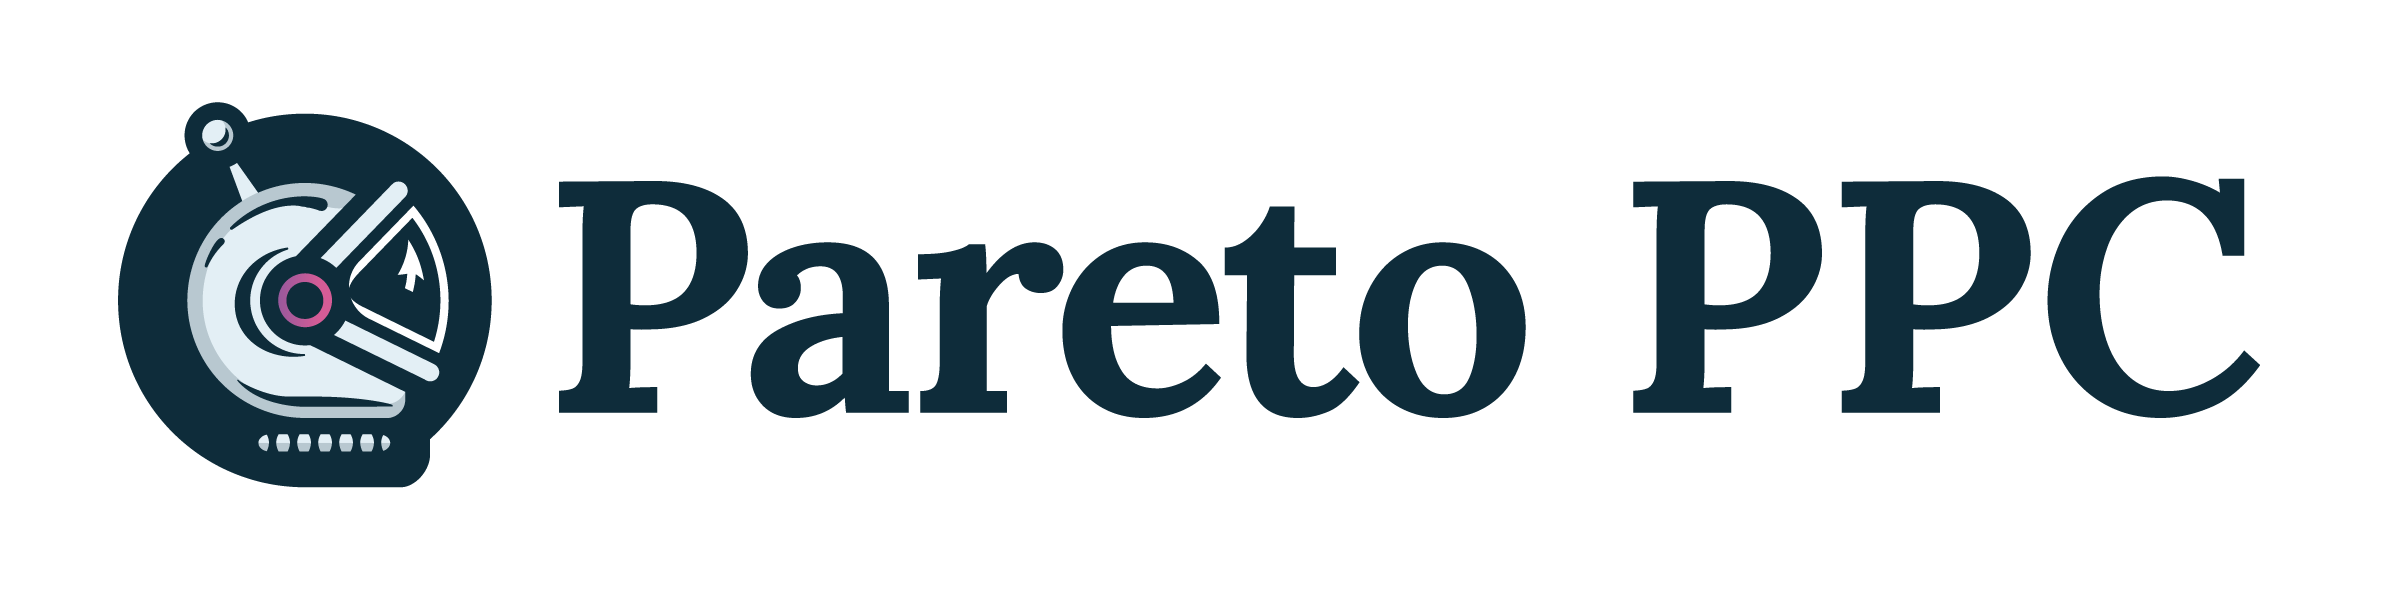 Pareto PPC company logo